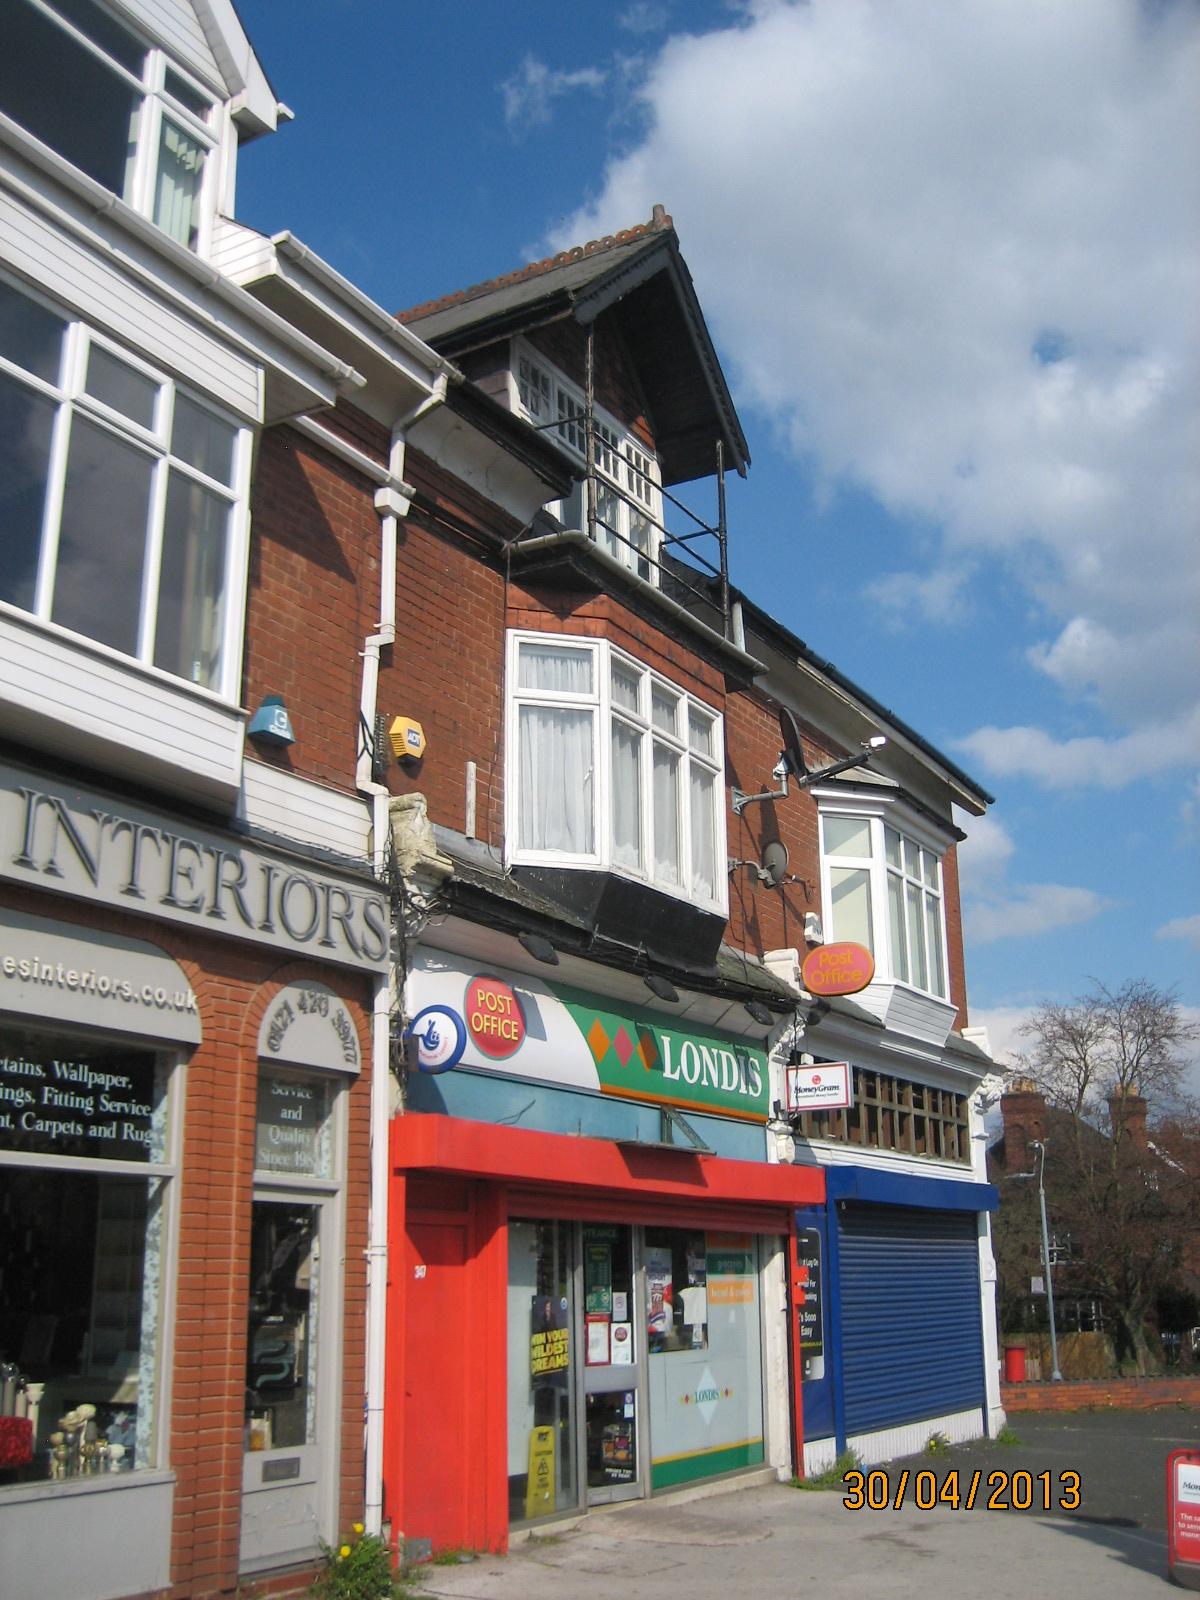 347A Hagley Road, Edgbaston, Birmingham